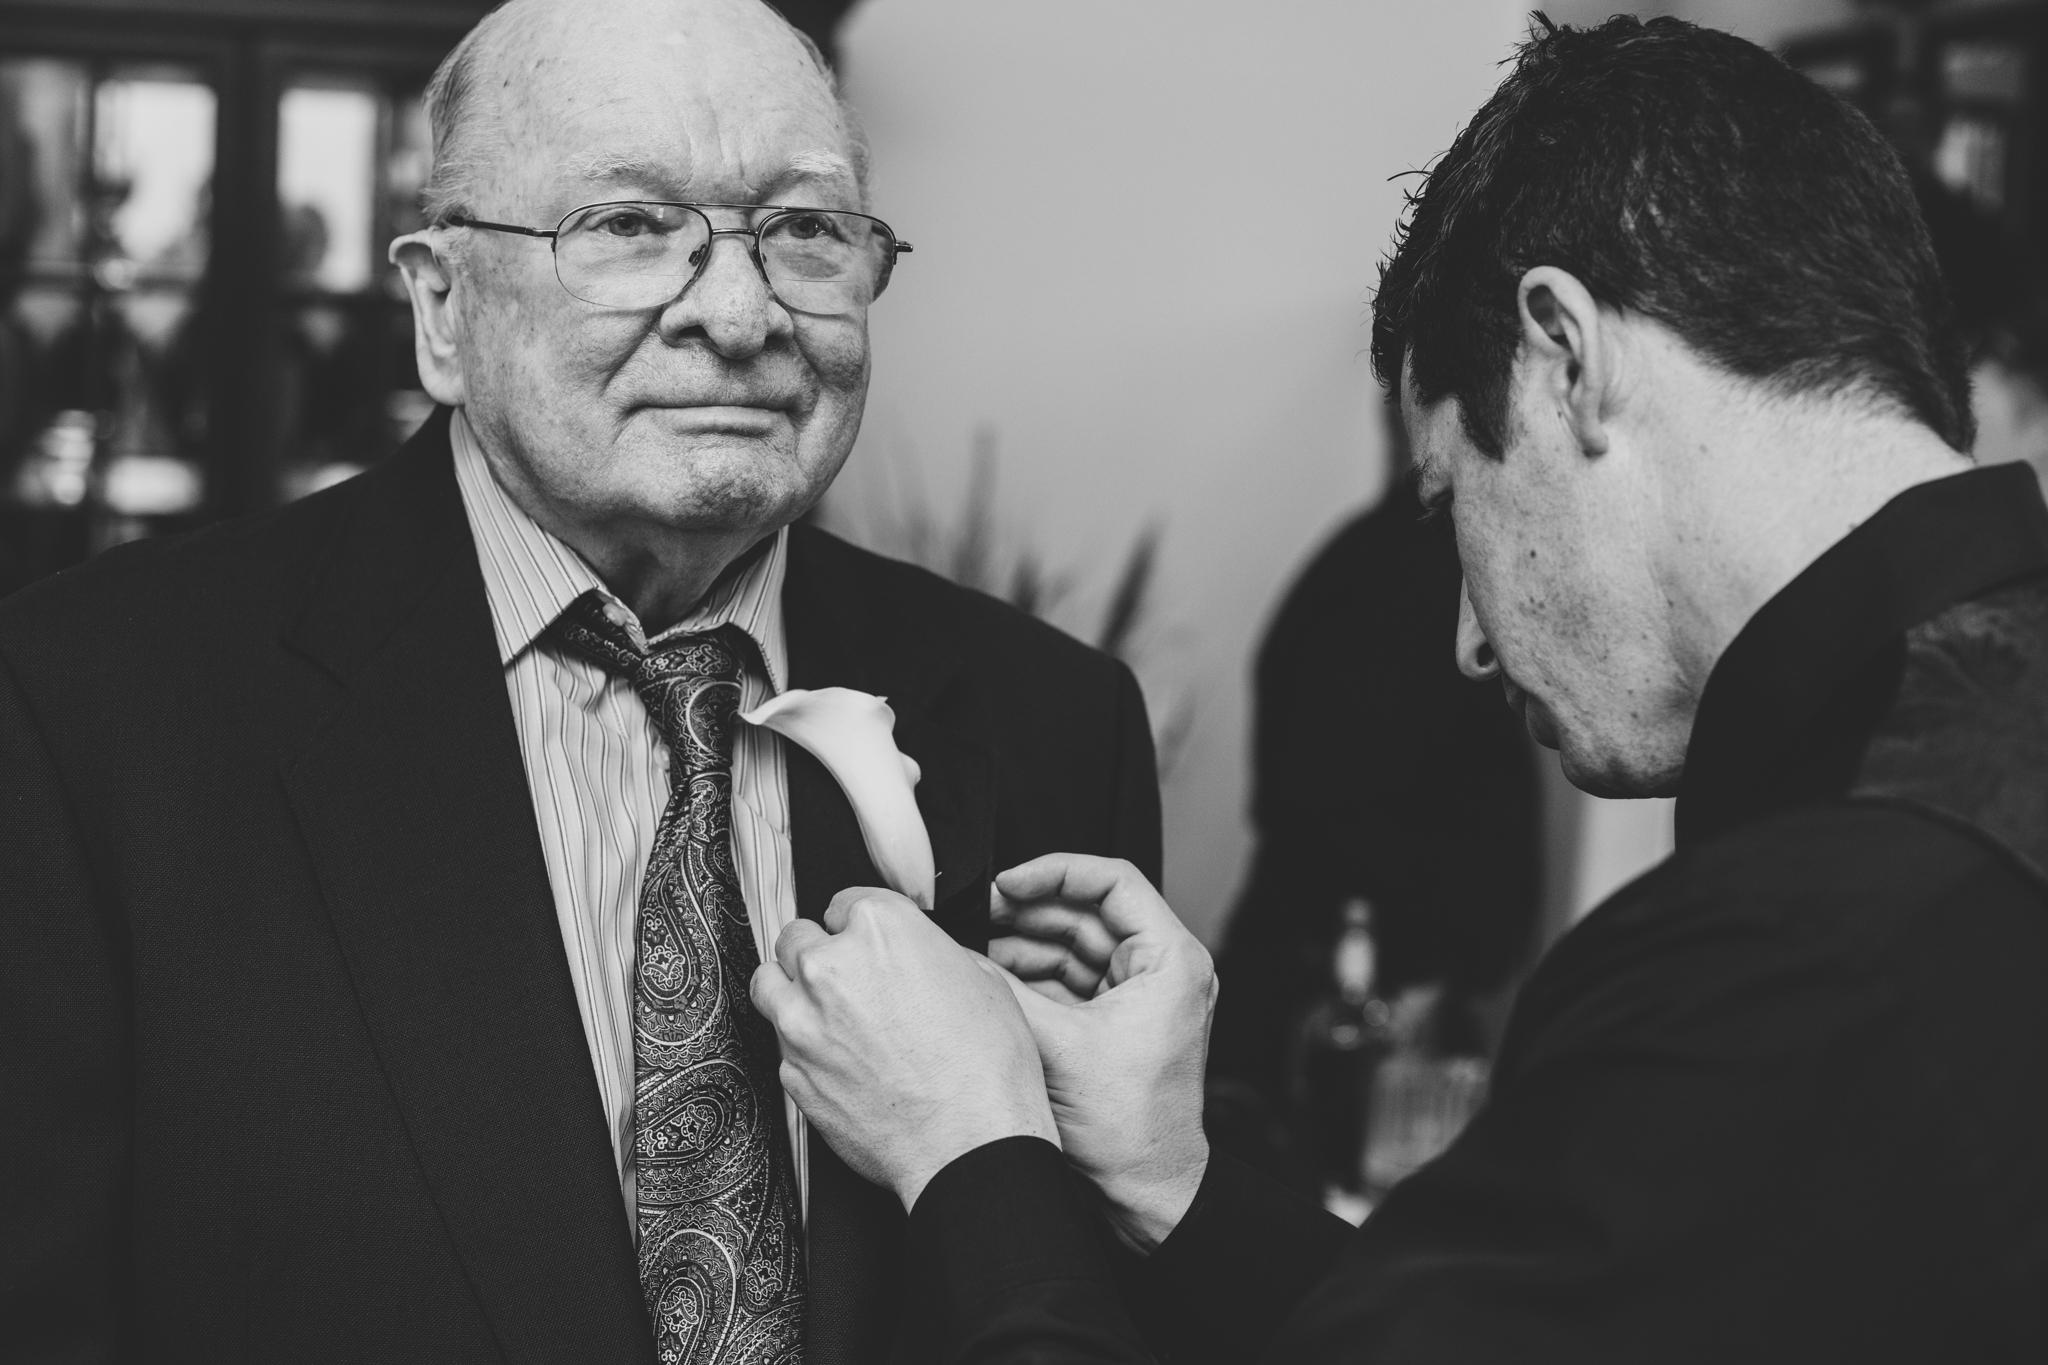 groom puts boutoniere on grandfather mj